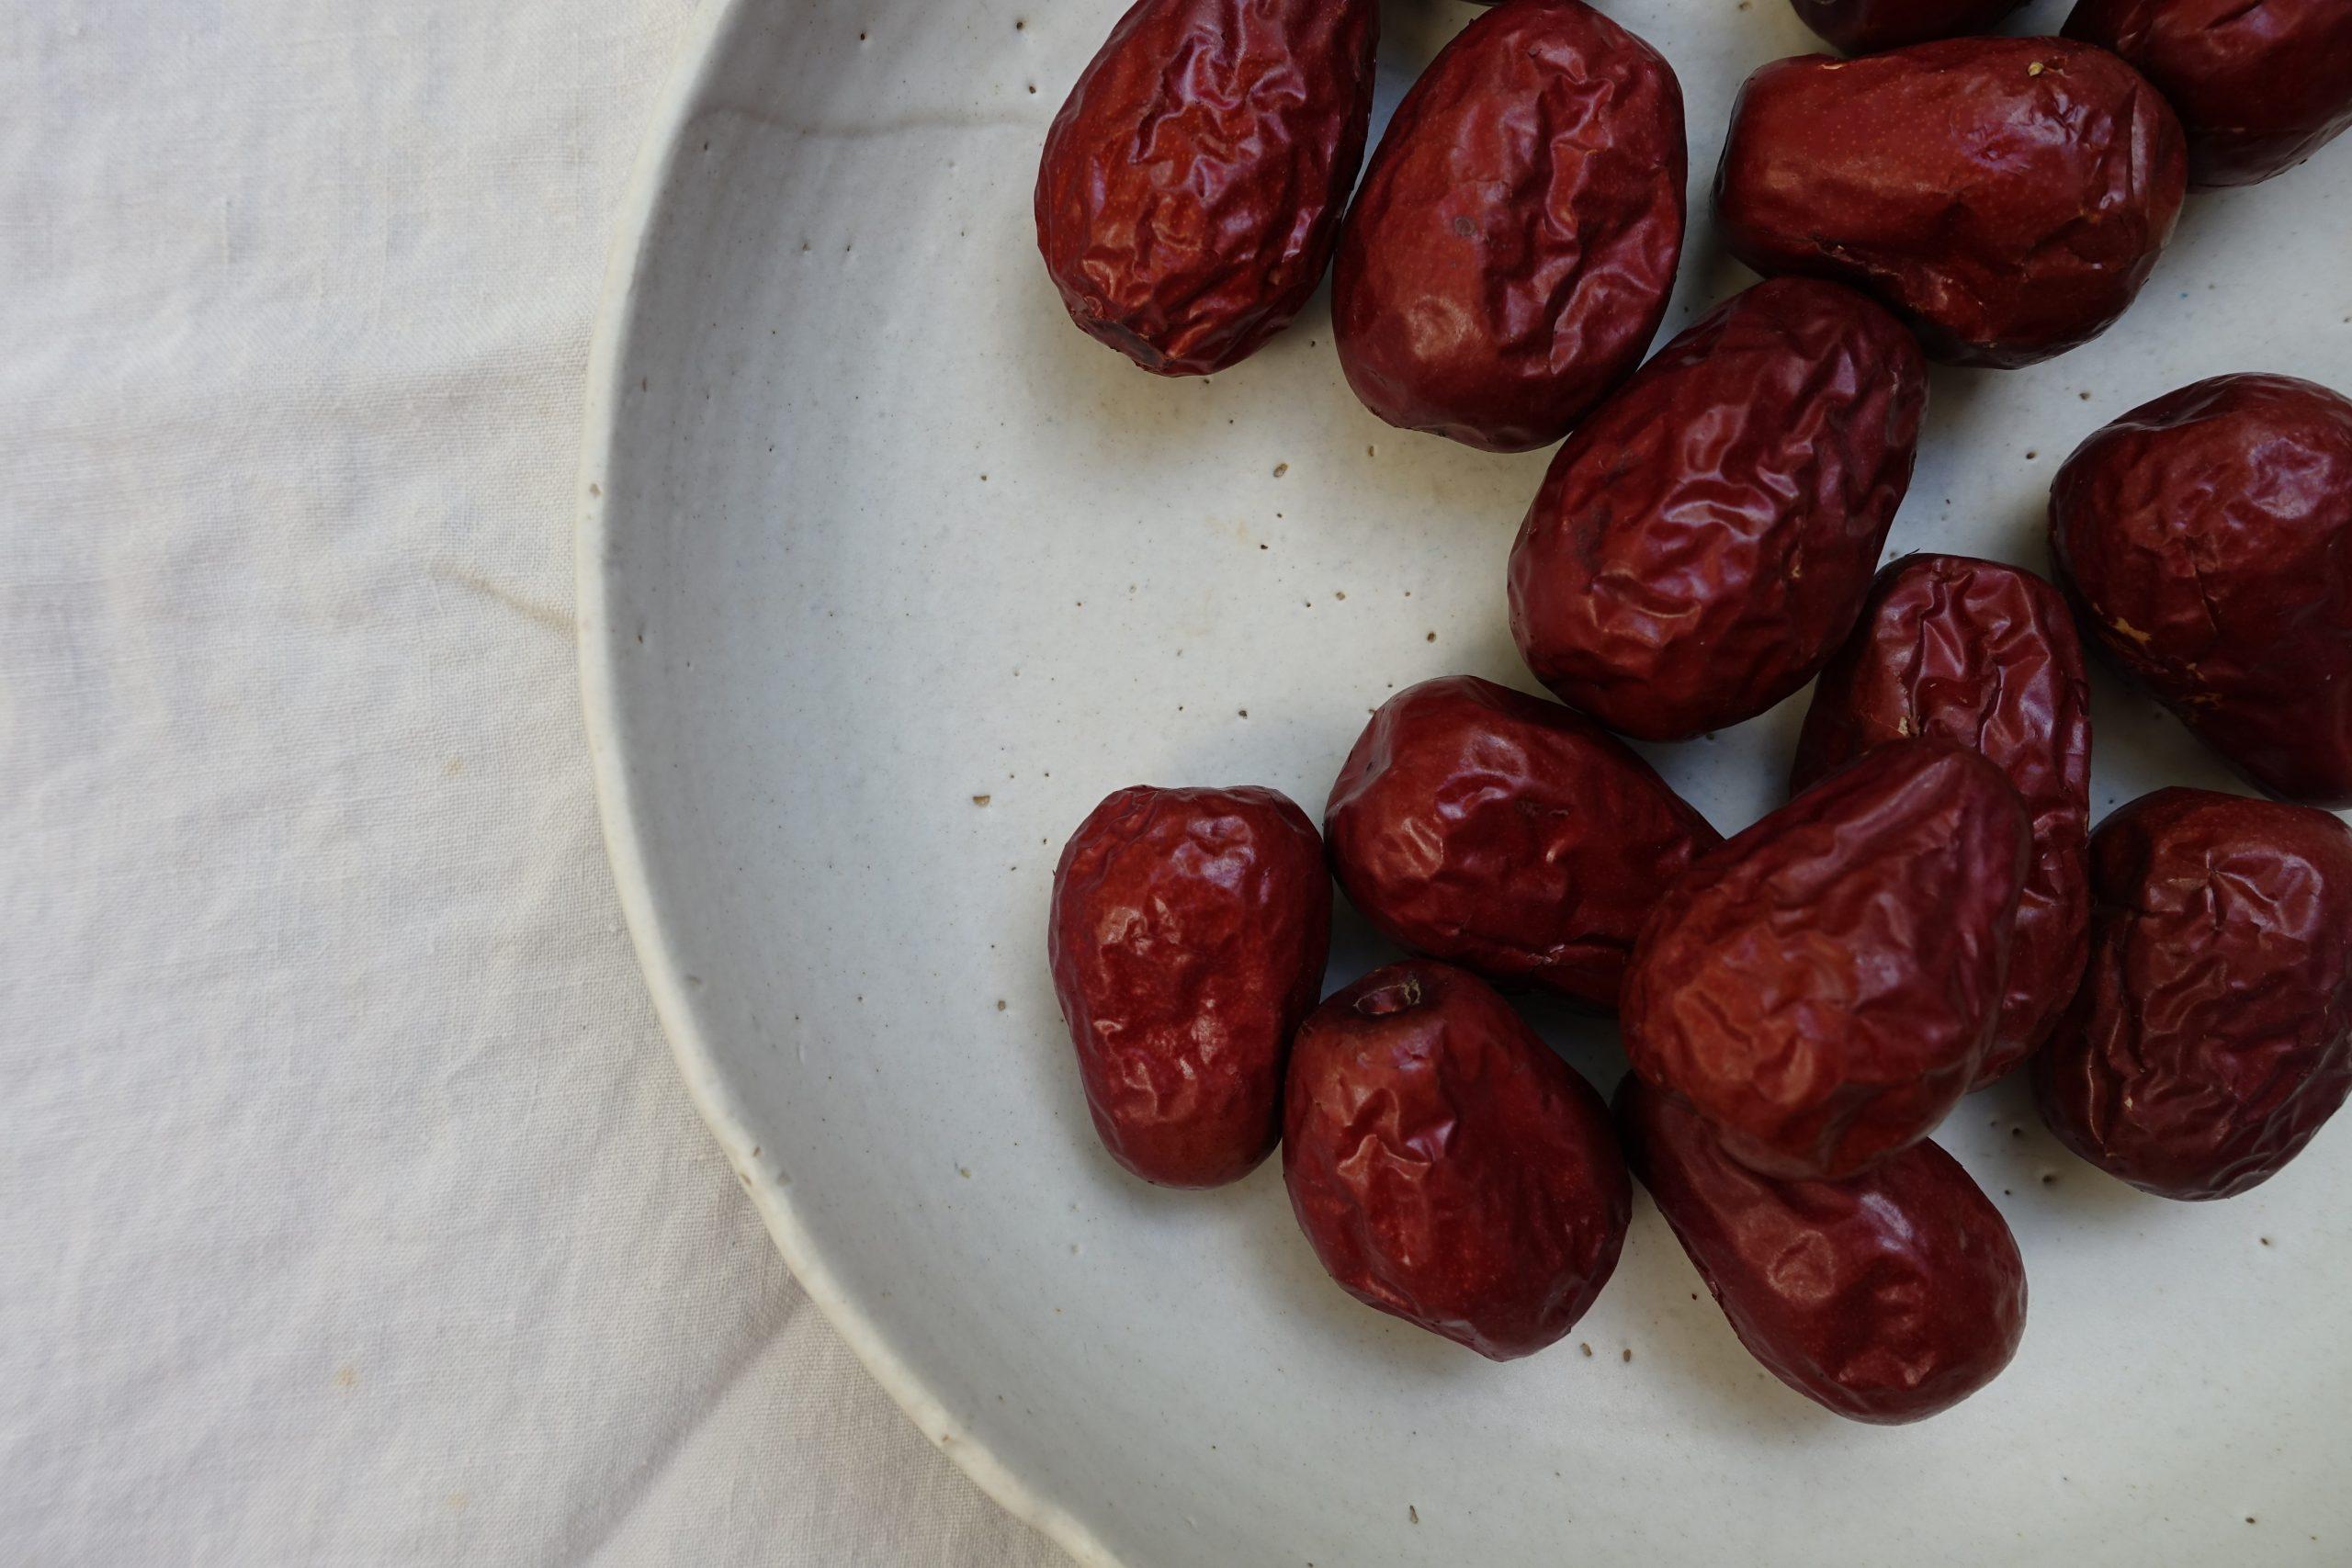 Eat an odd number of dates (Hari Raya)